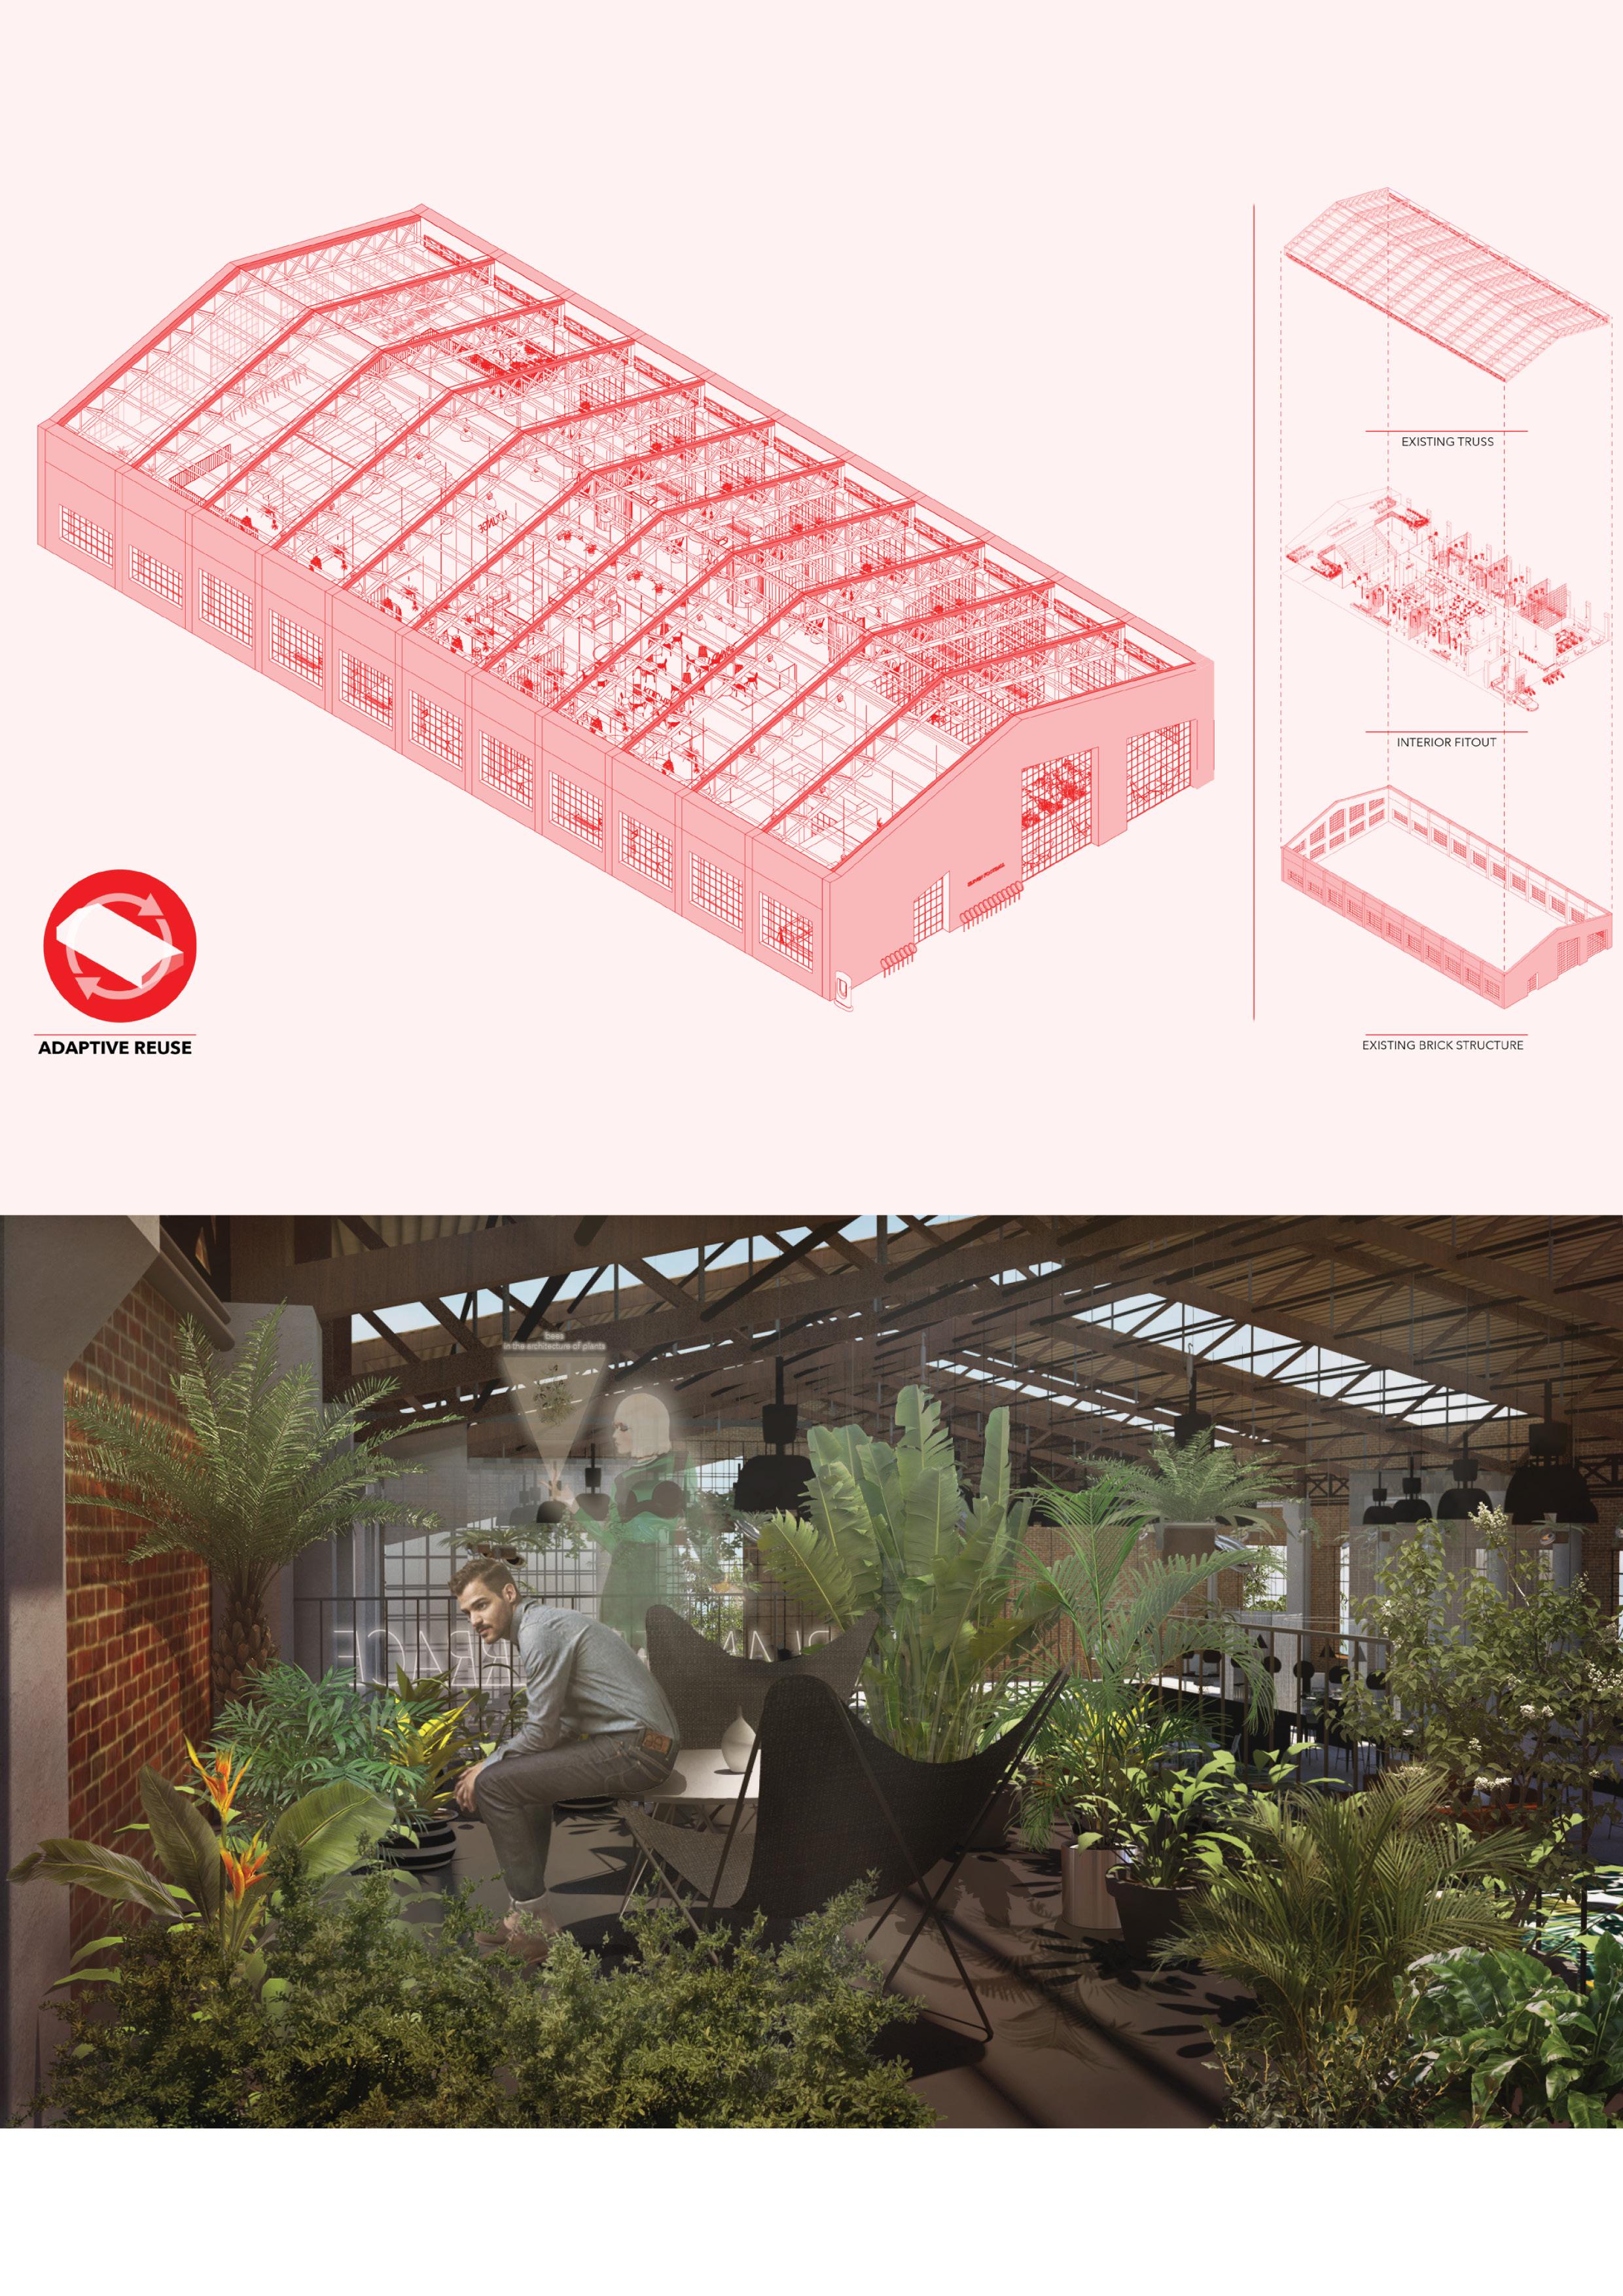 Atelier Aitken Modern Workplace design - Sustainable Design - Adaptive Reuse.jpg